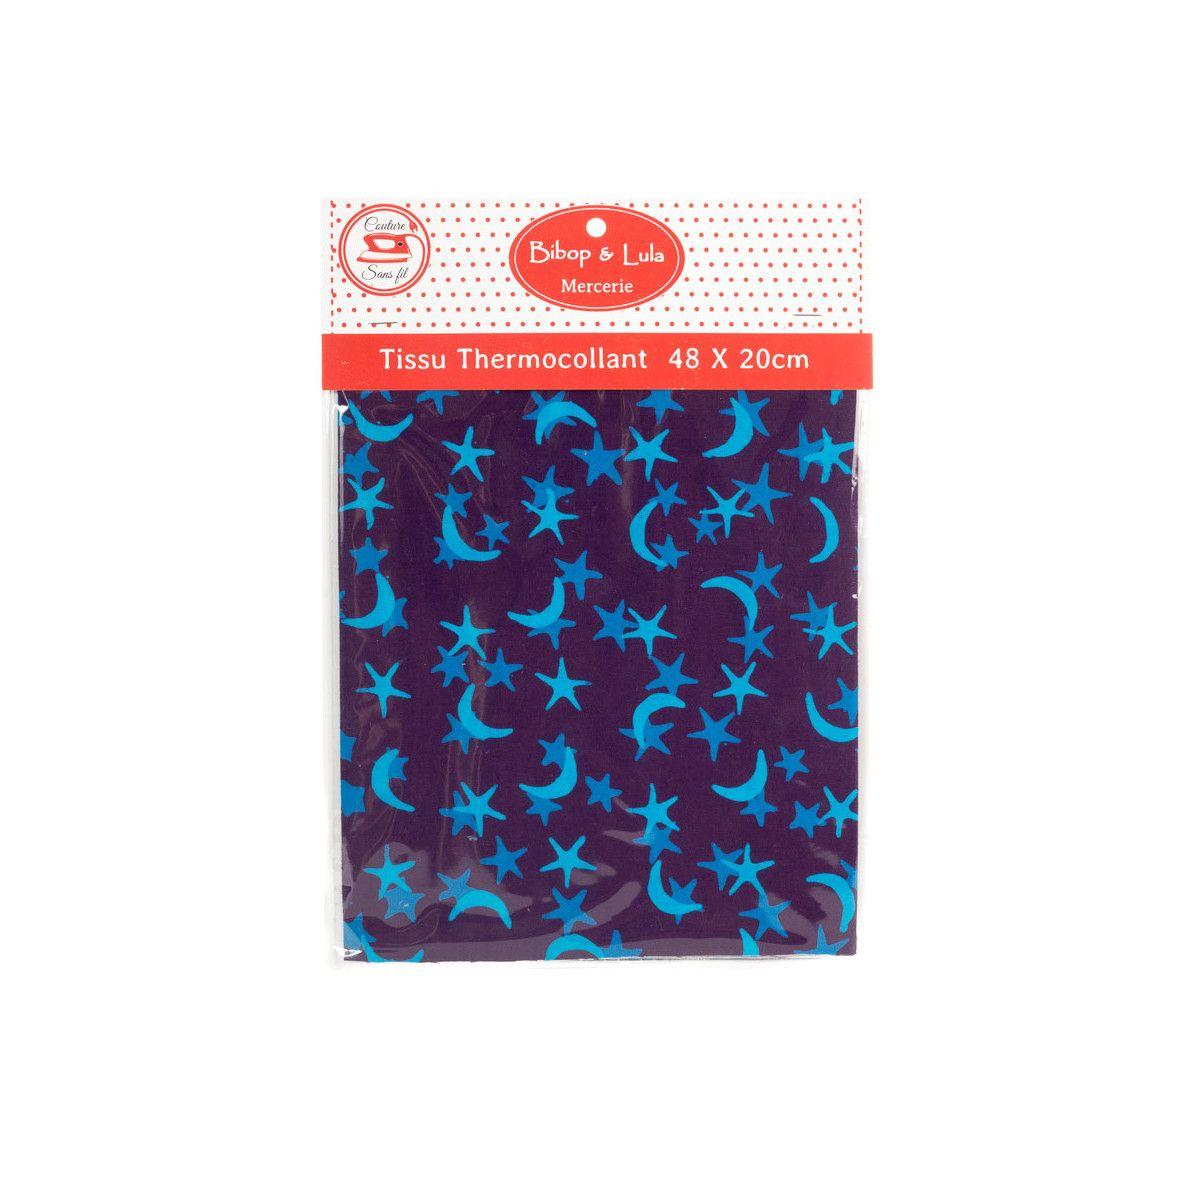 Tissu thermocollant Manille